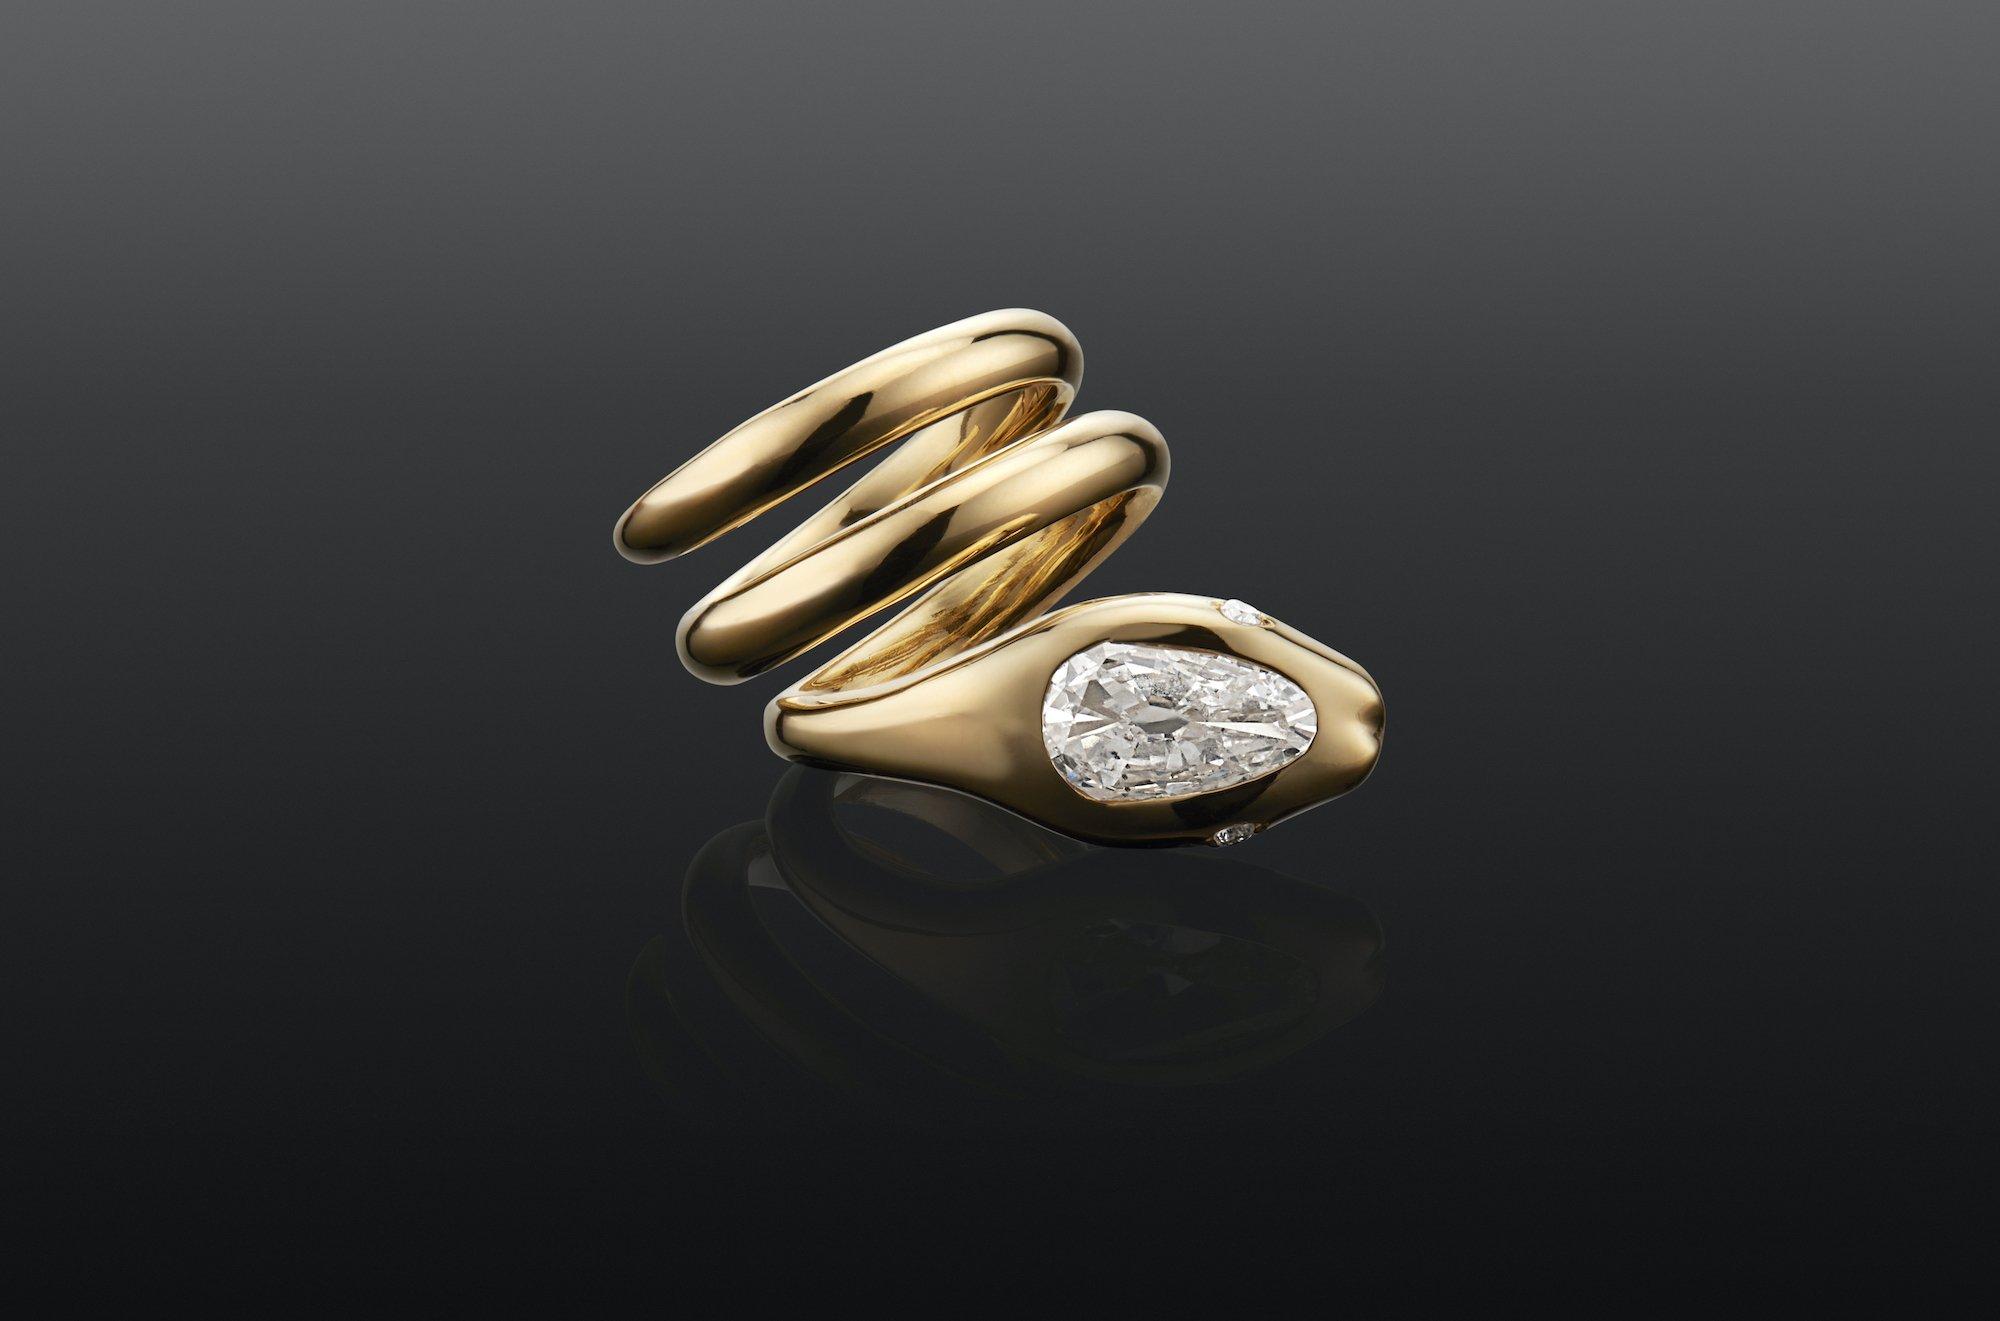 Arielle Ratner, Home, Bespoke Jewelry